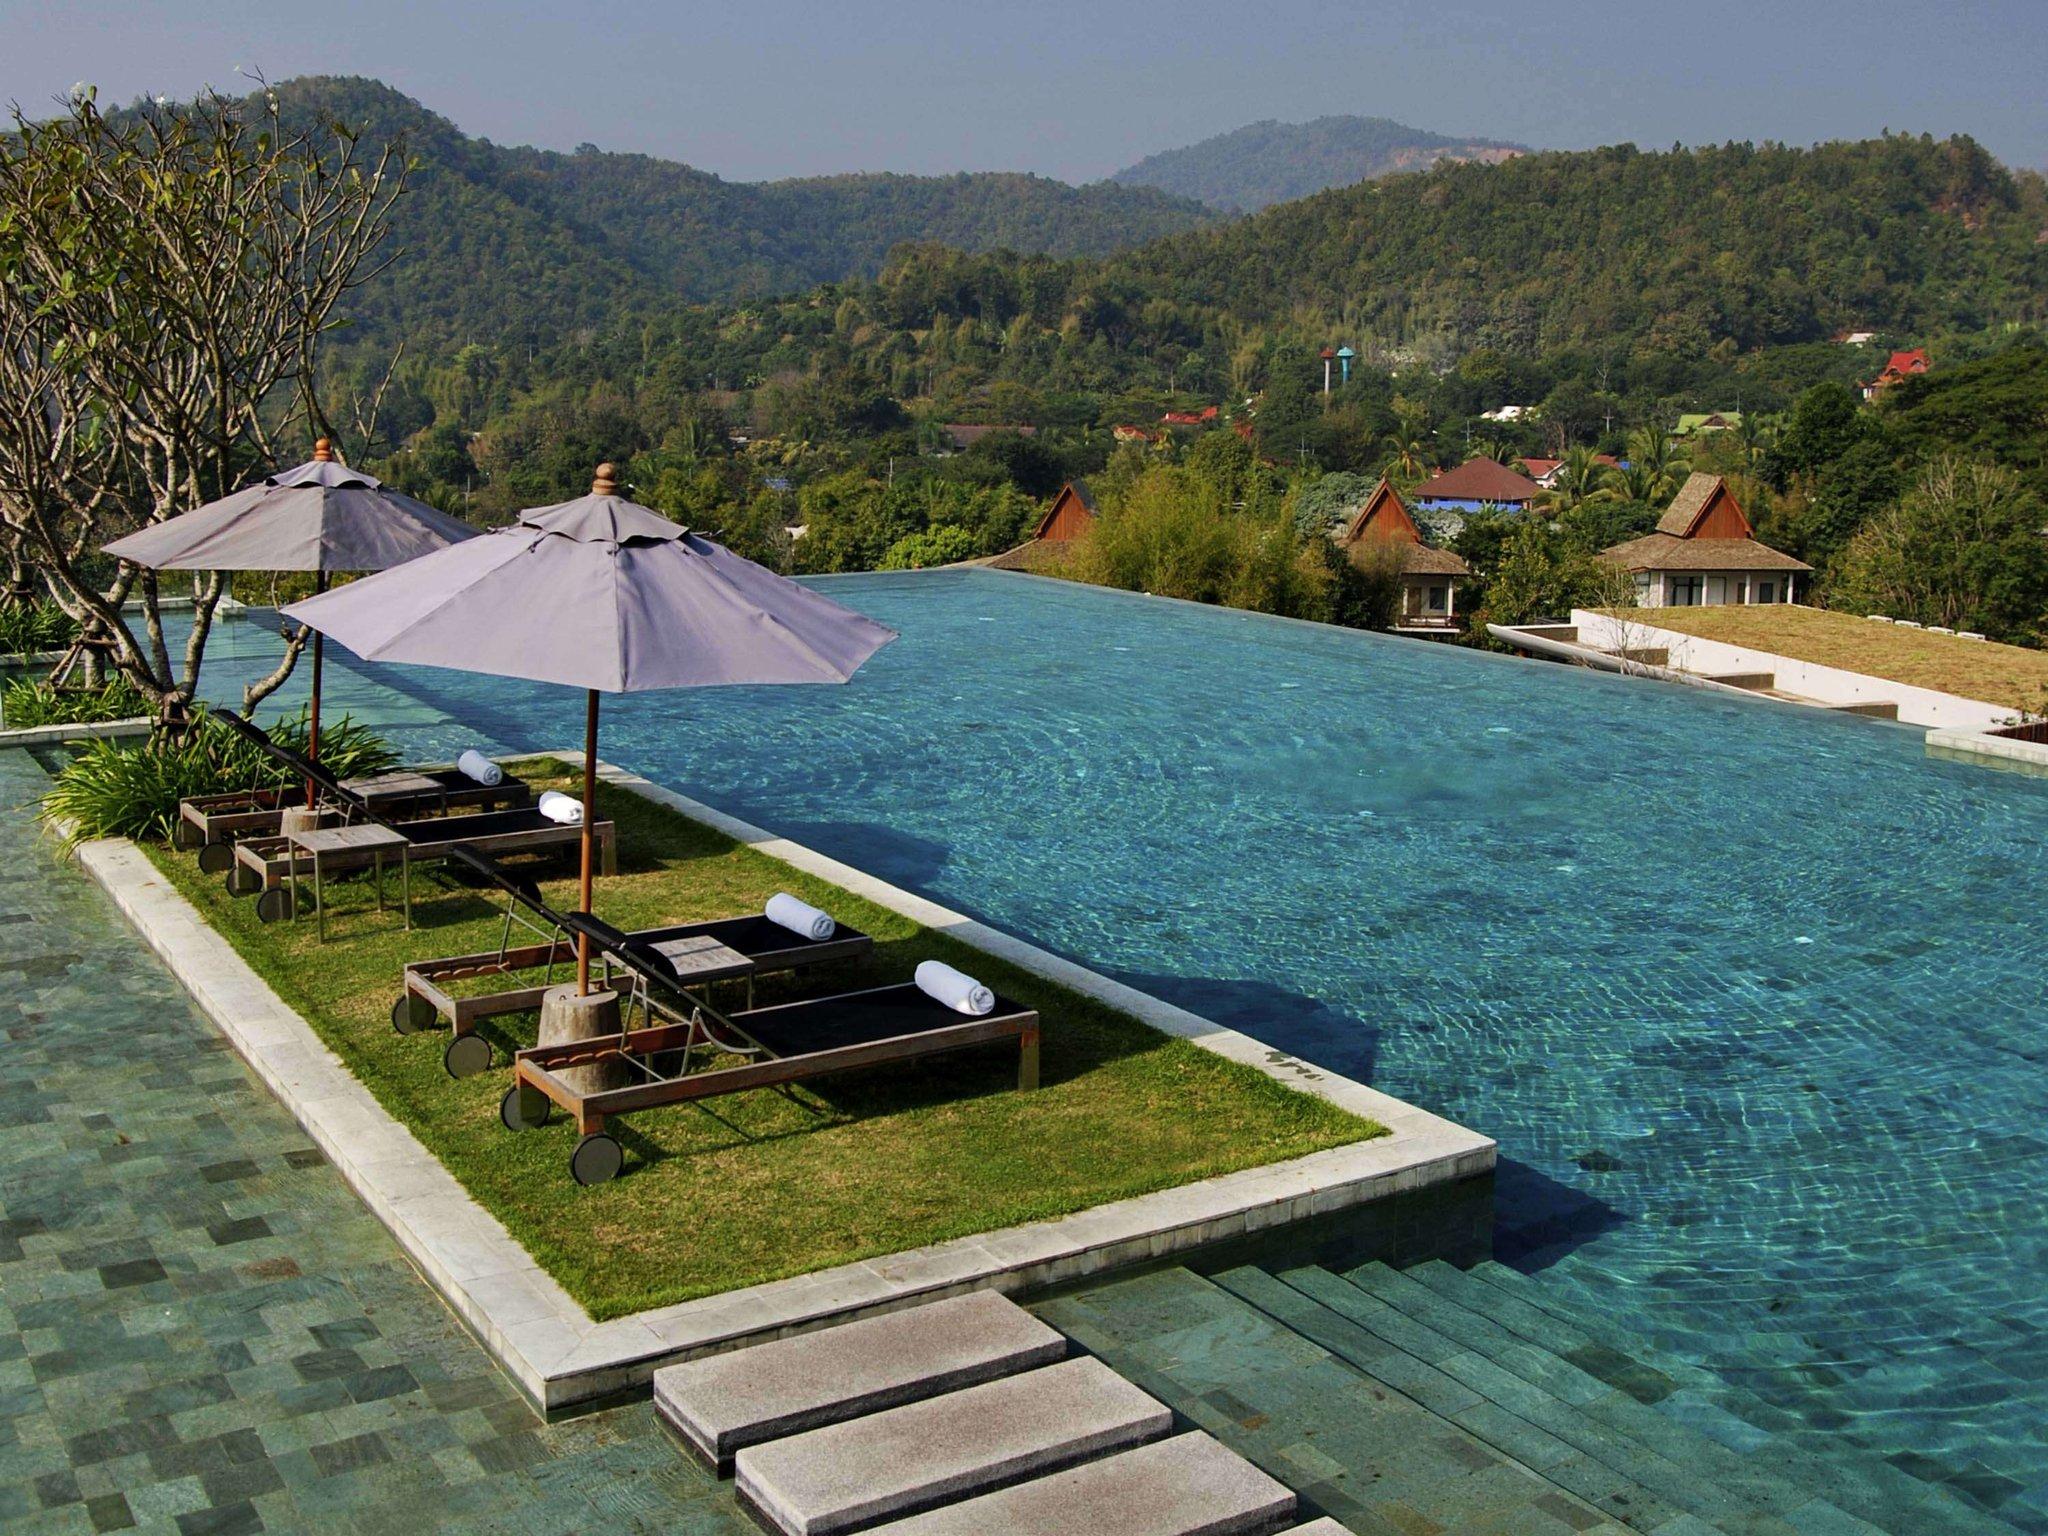 Veranda Chiang Mai -The High Resort